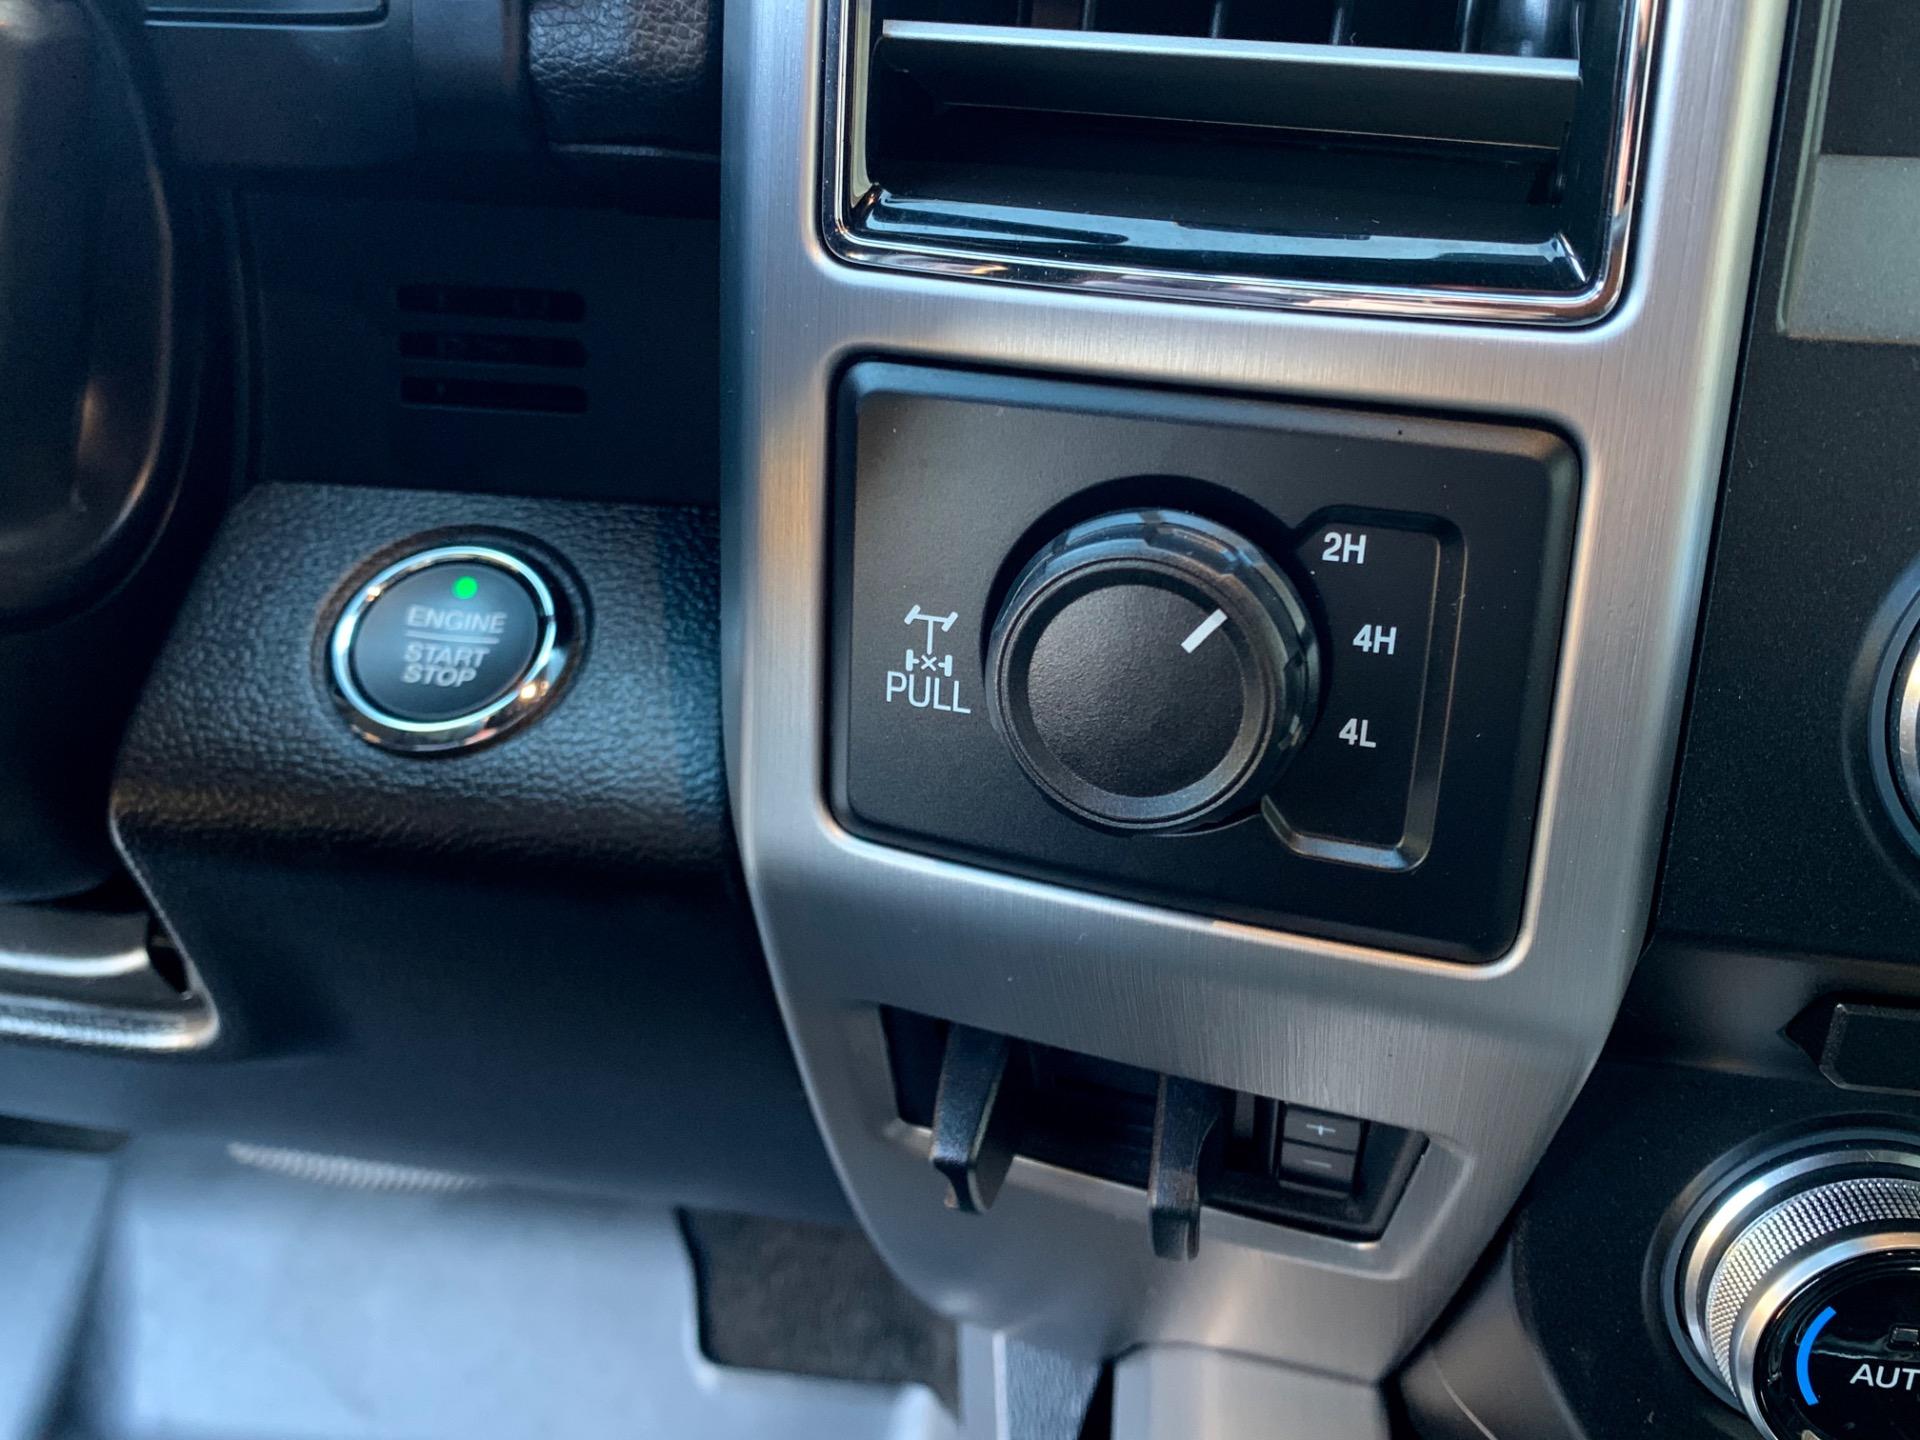 Used-2018-Ford-F-250-Super-Duty-Platinum